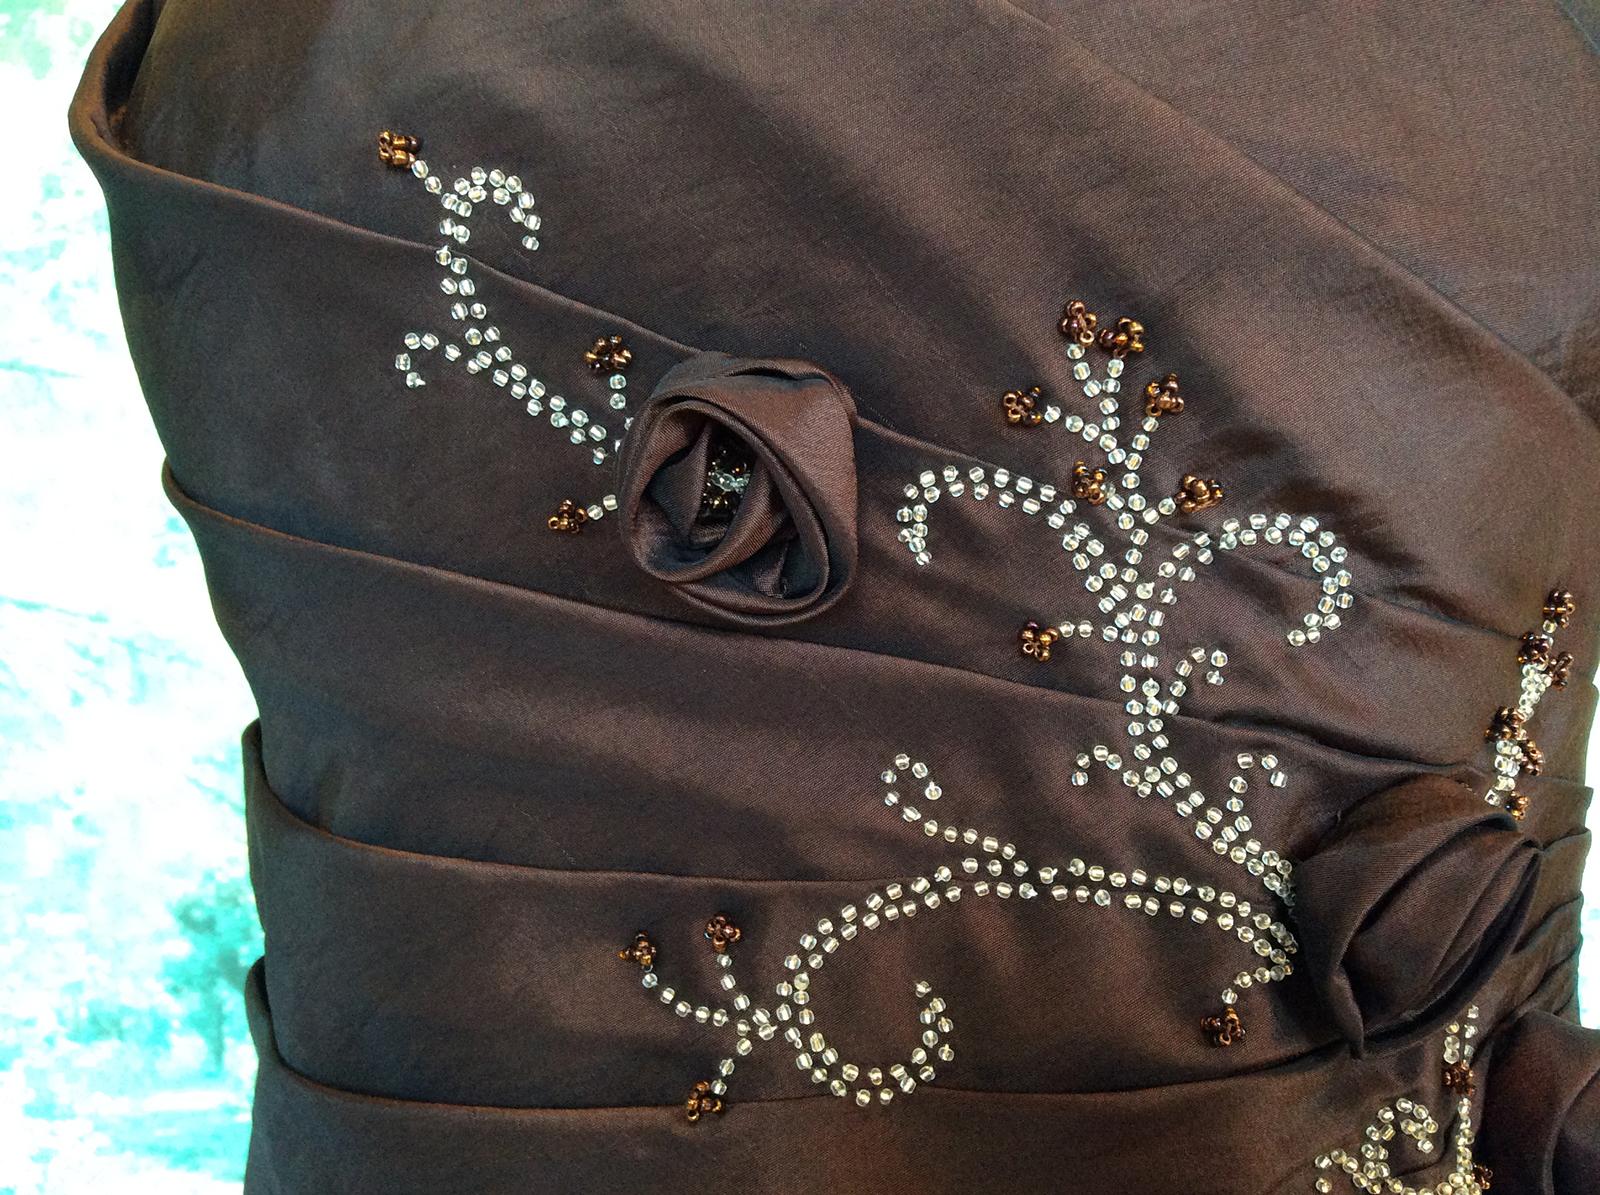 Robe bustier longue rebrodée de perles #7